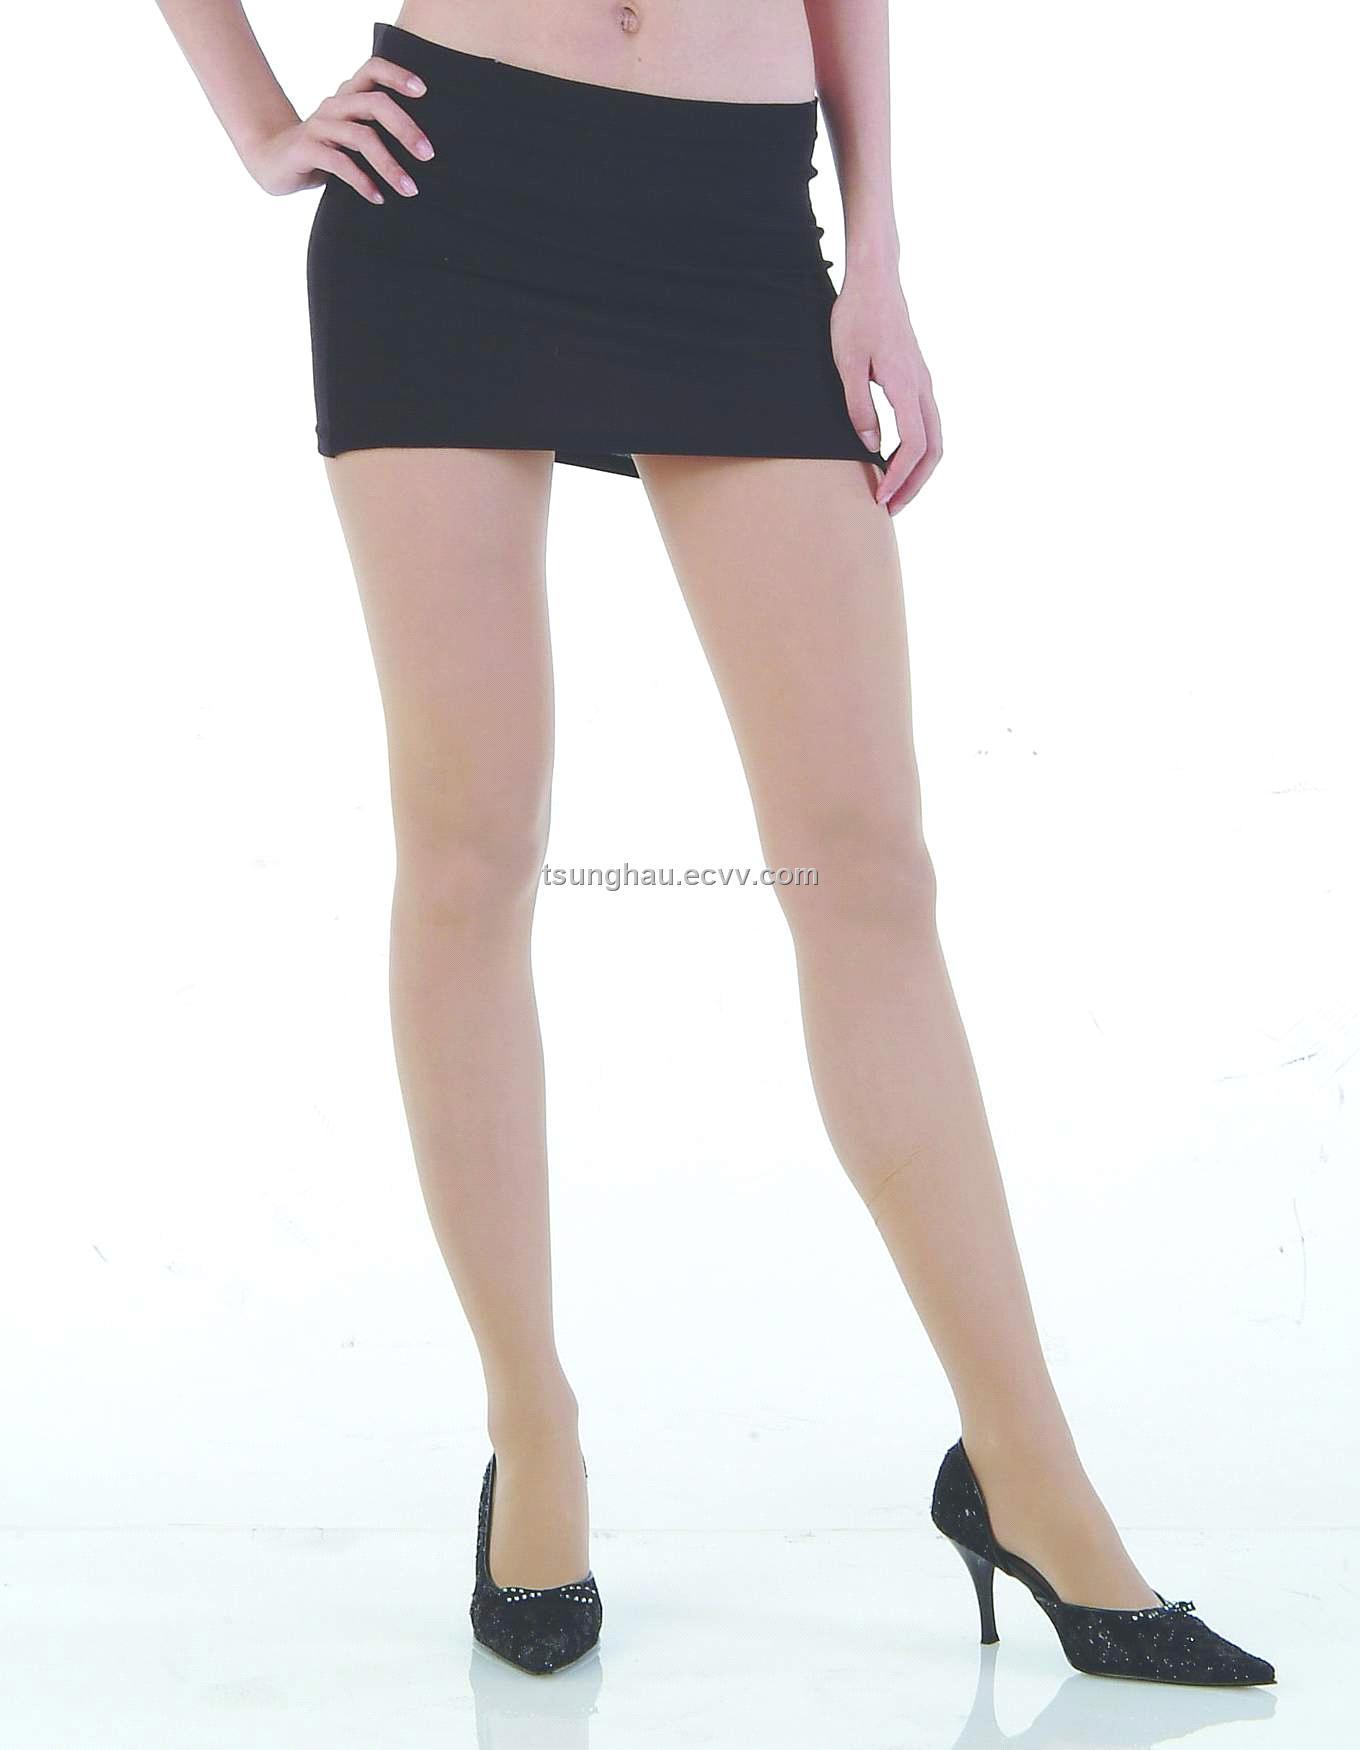 19b694303b varicose veins stockings purchasing, souring agent | ECVV.com purchasing  service platform